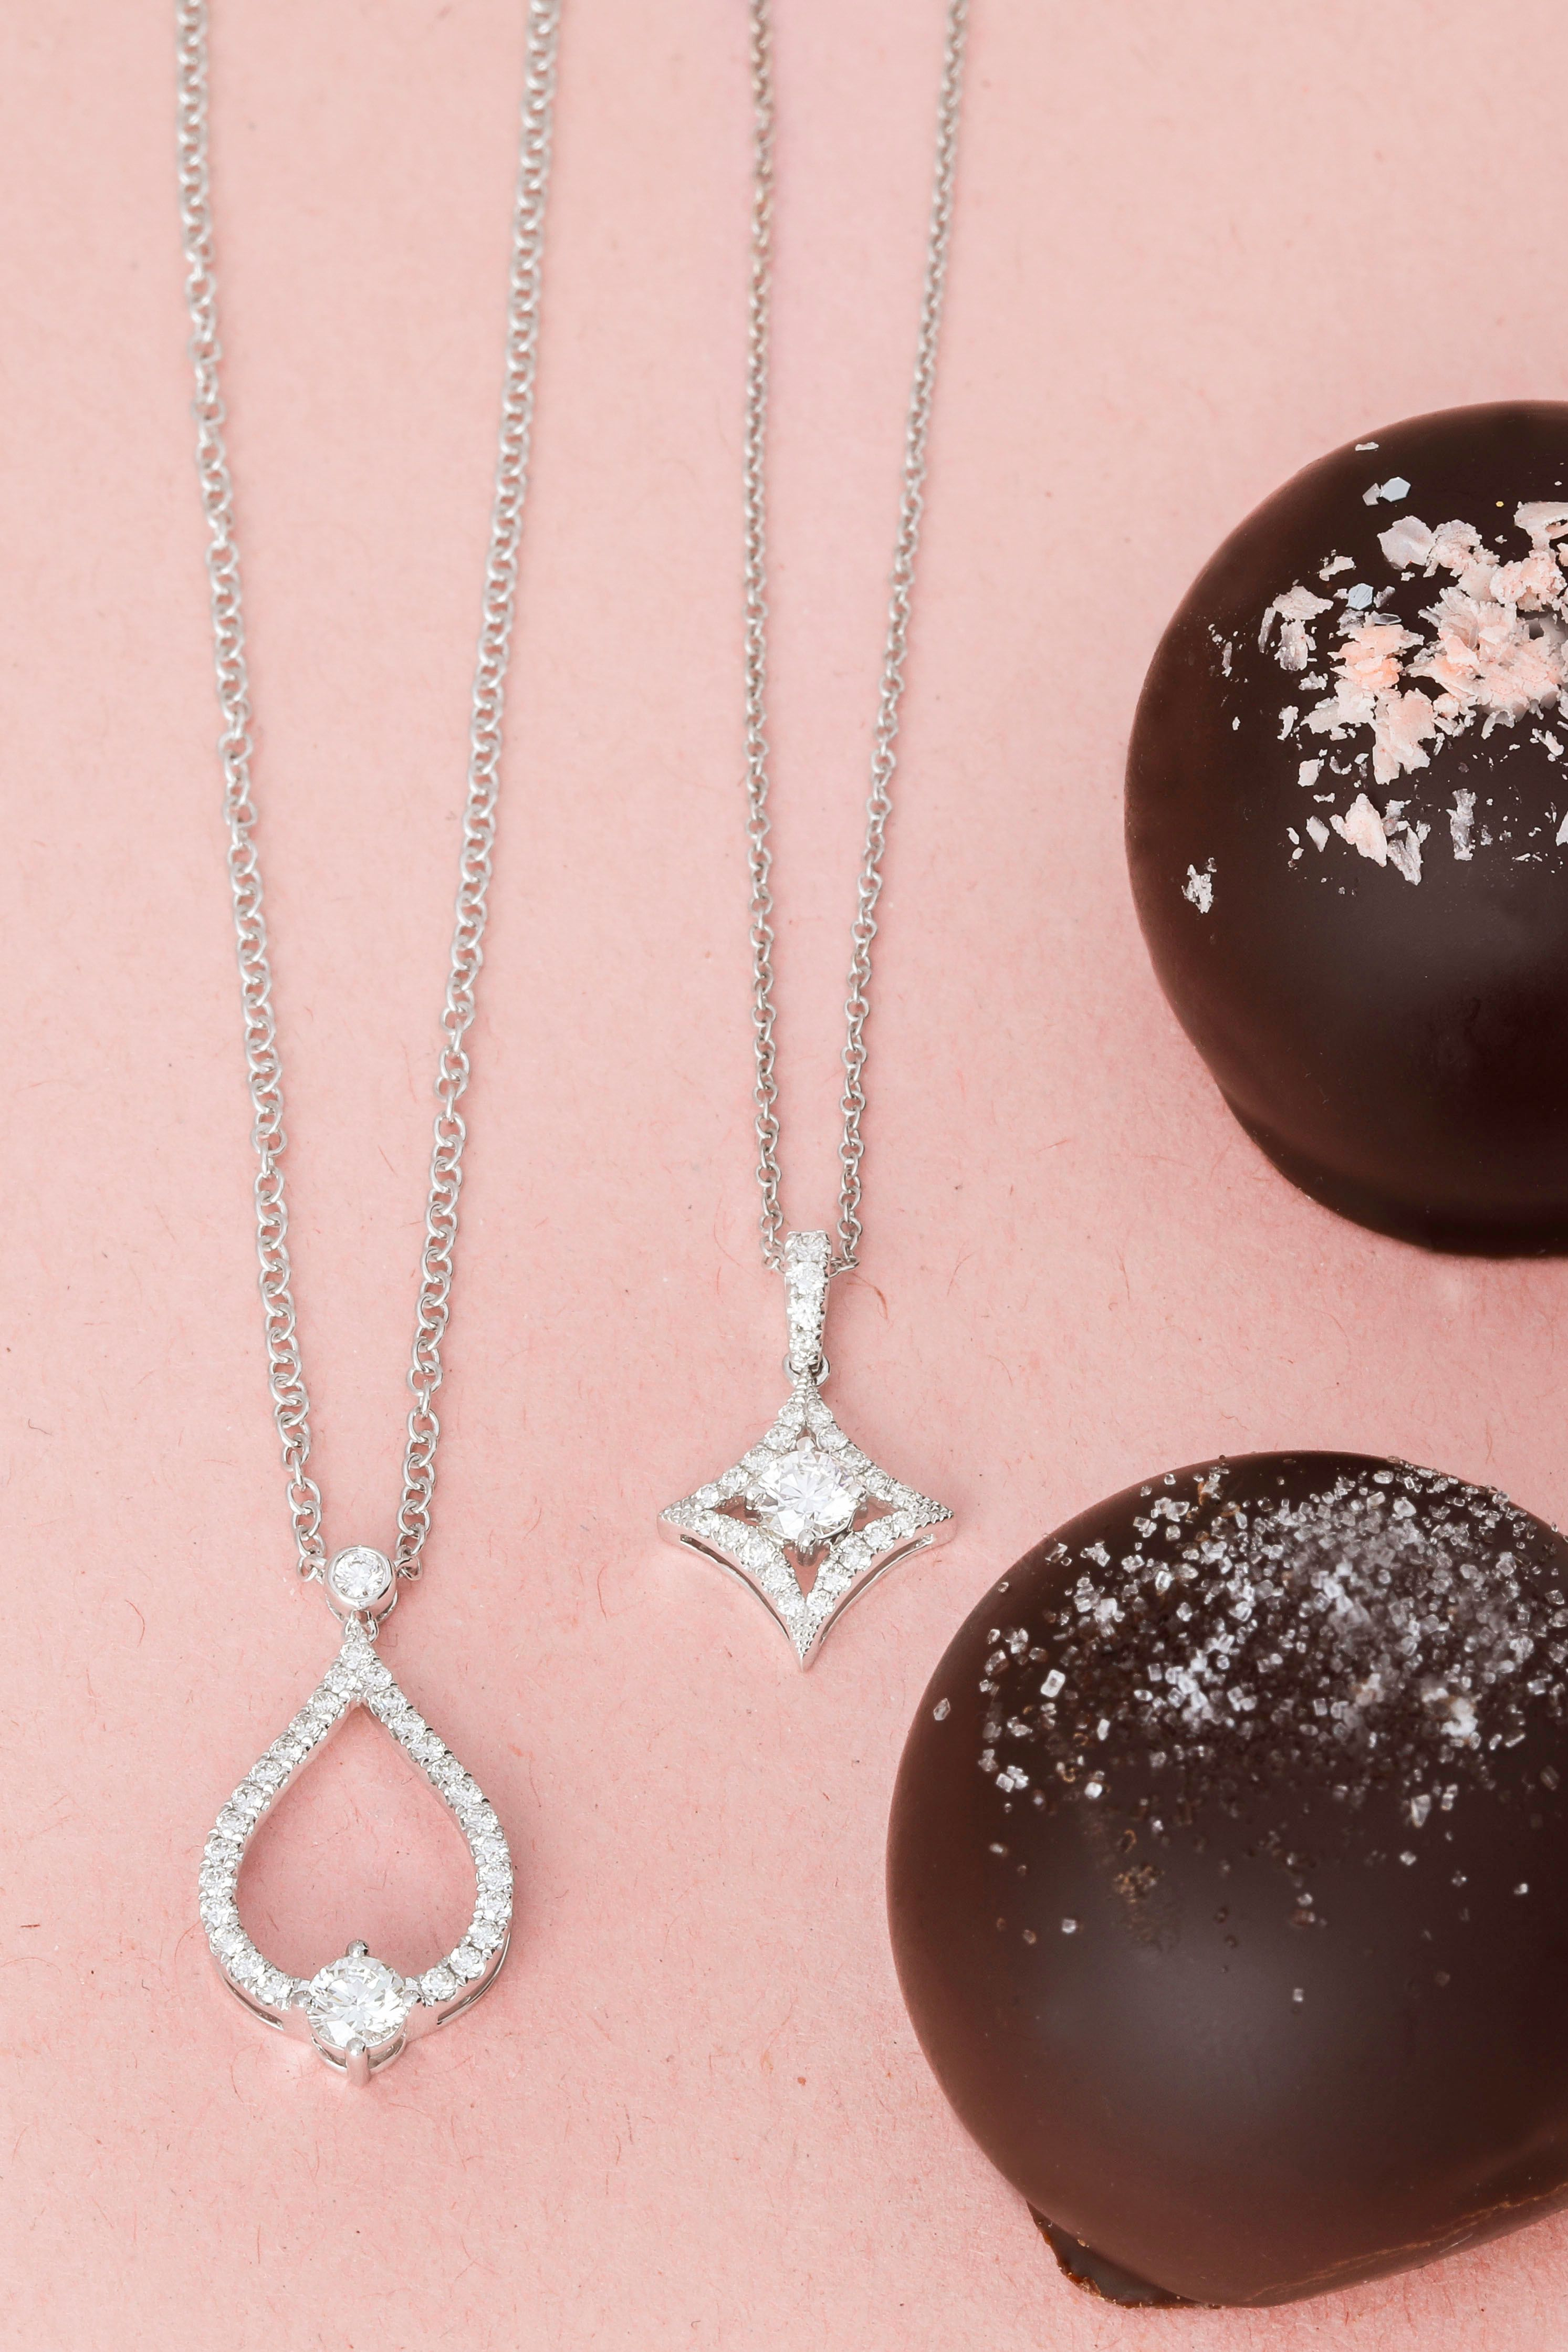 Diamonds and chocolate...the perfect pair. Luxury